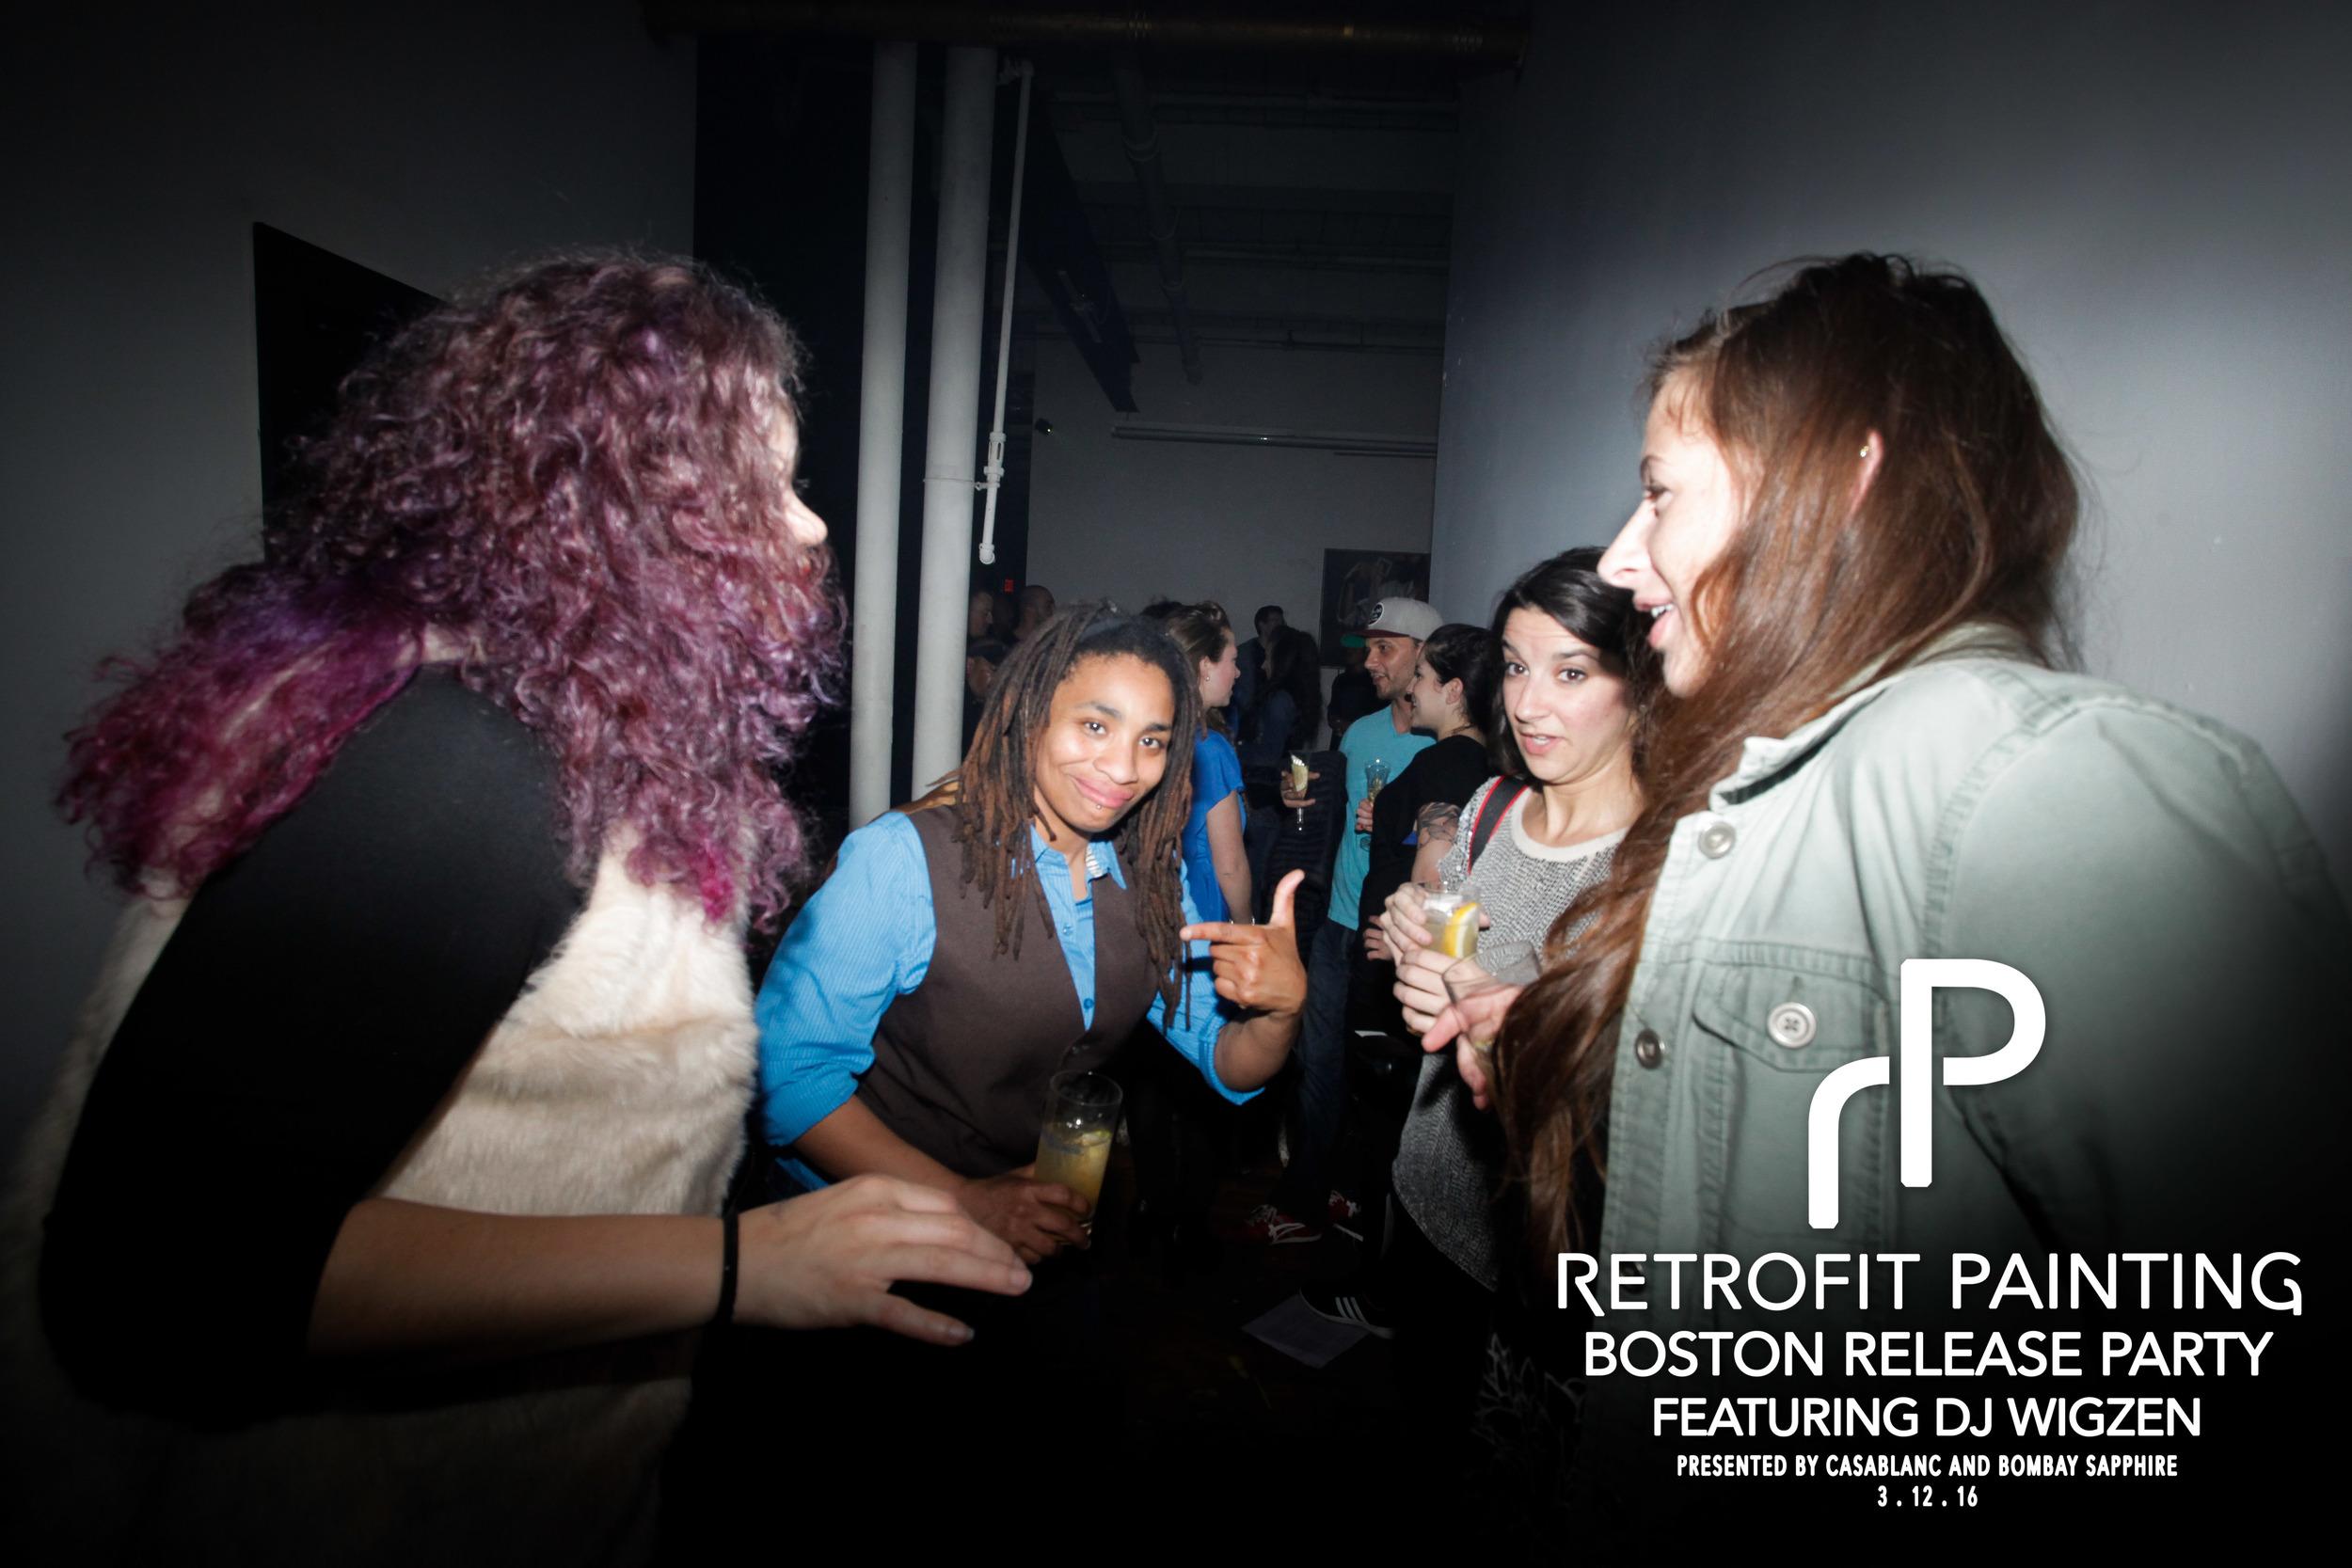 Retrofit Painting Boston Release Party 0137.jpg